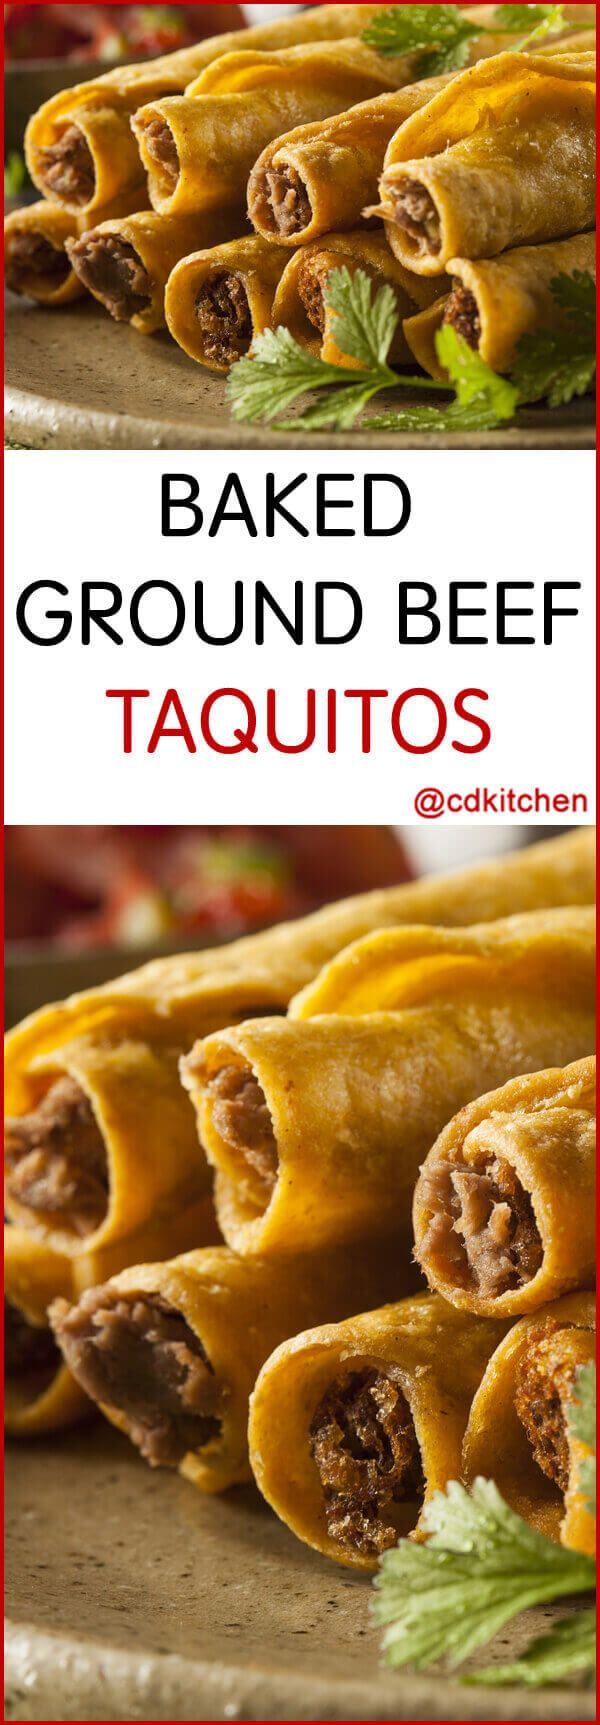 Baked Ground Beef Taquitos Recipe | CDKitchen.com